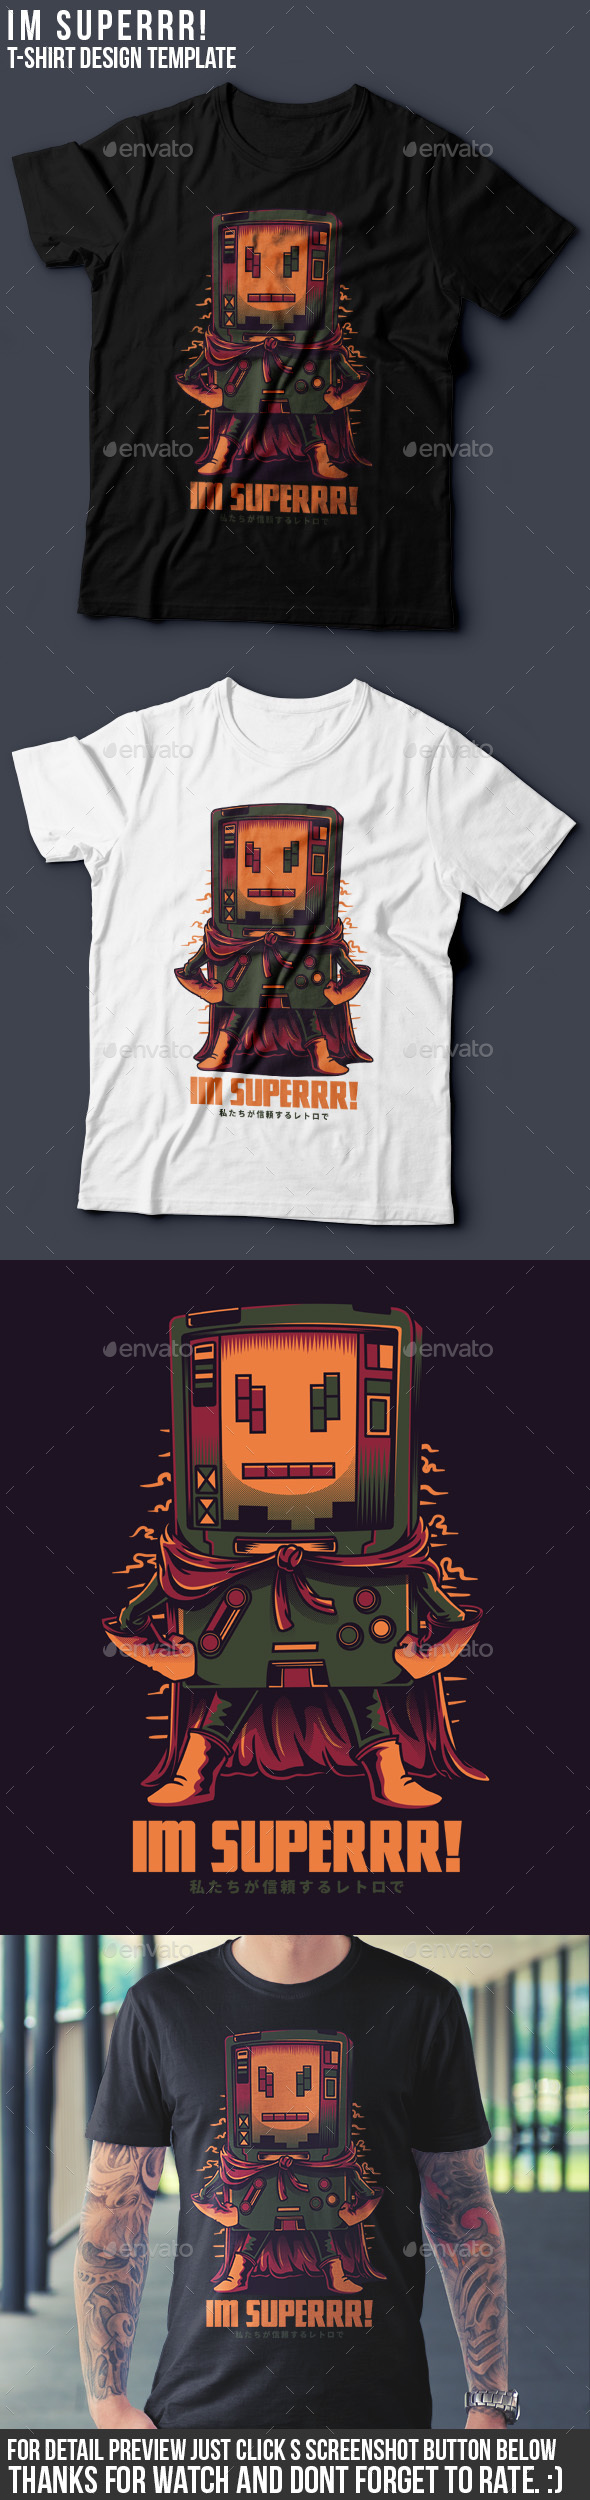 Im Superrr! T-Shirt Design - Funny Designs